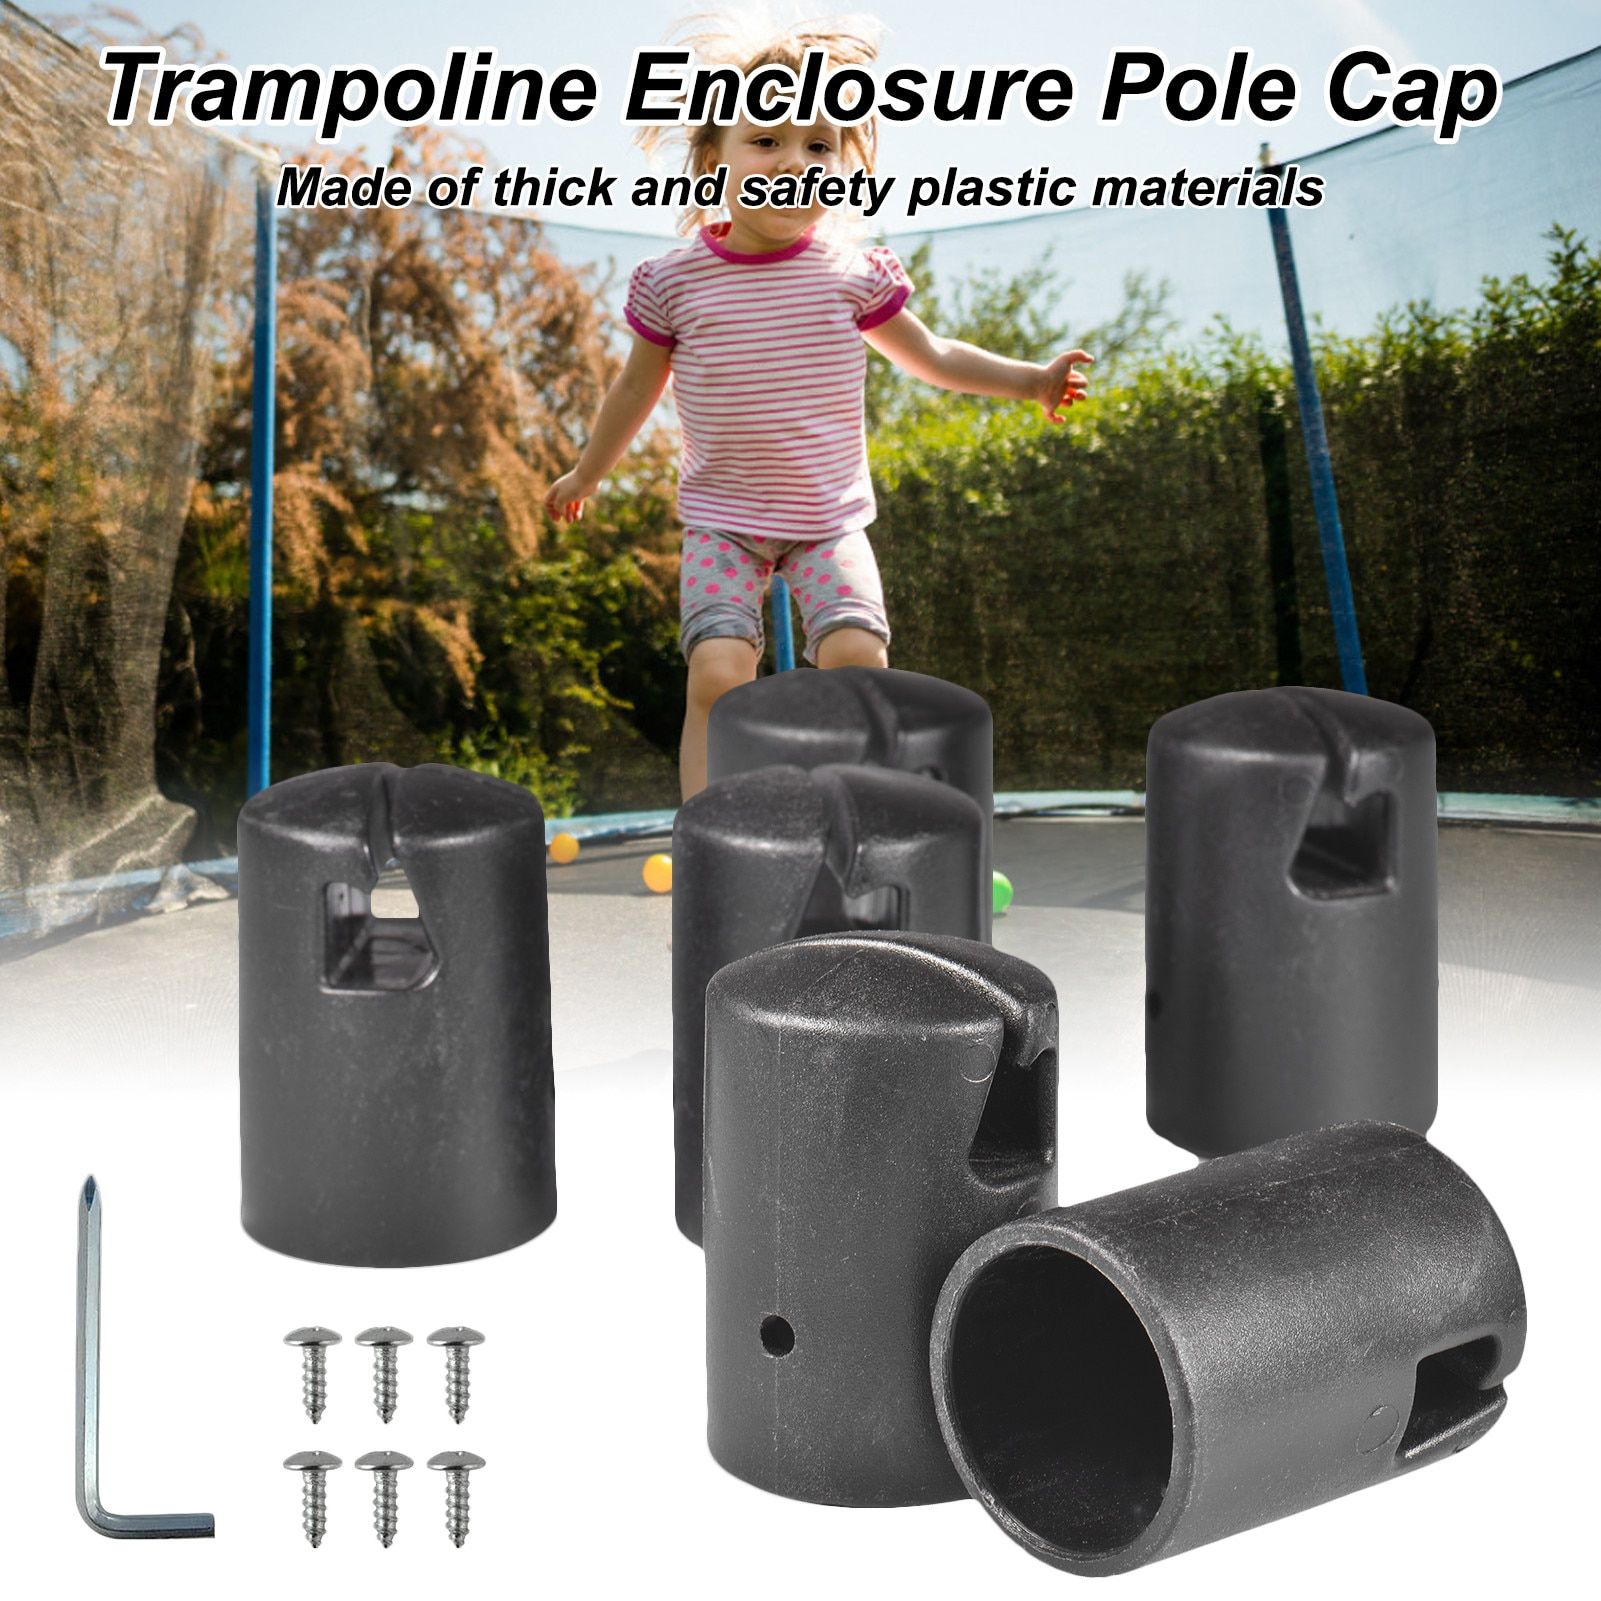 Trampoline Enclosure Pole Cap Diameter Trampoline Replacement Safety Caps For 1.26inch Trampoline Enclosure Pole 6Pcs